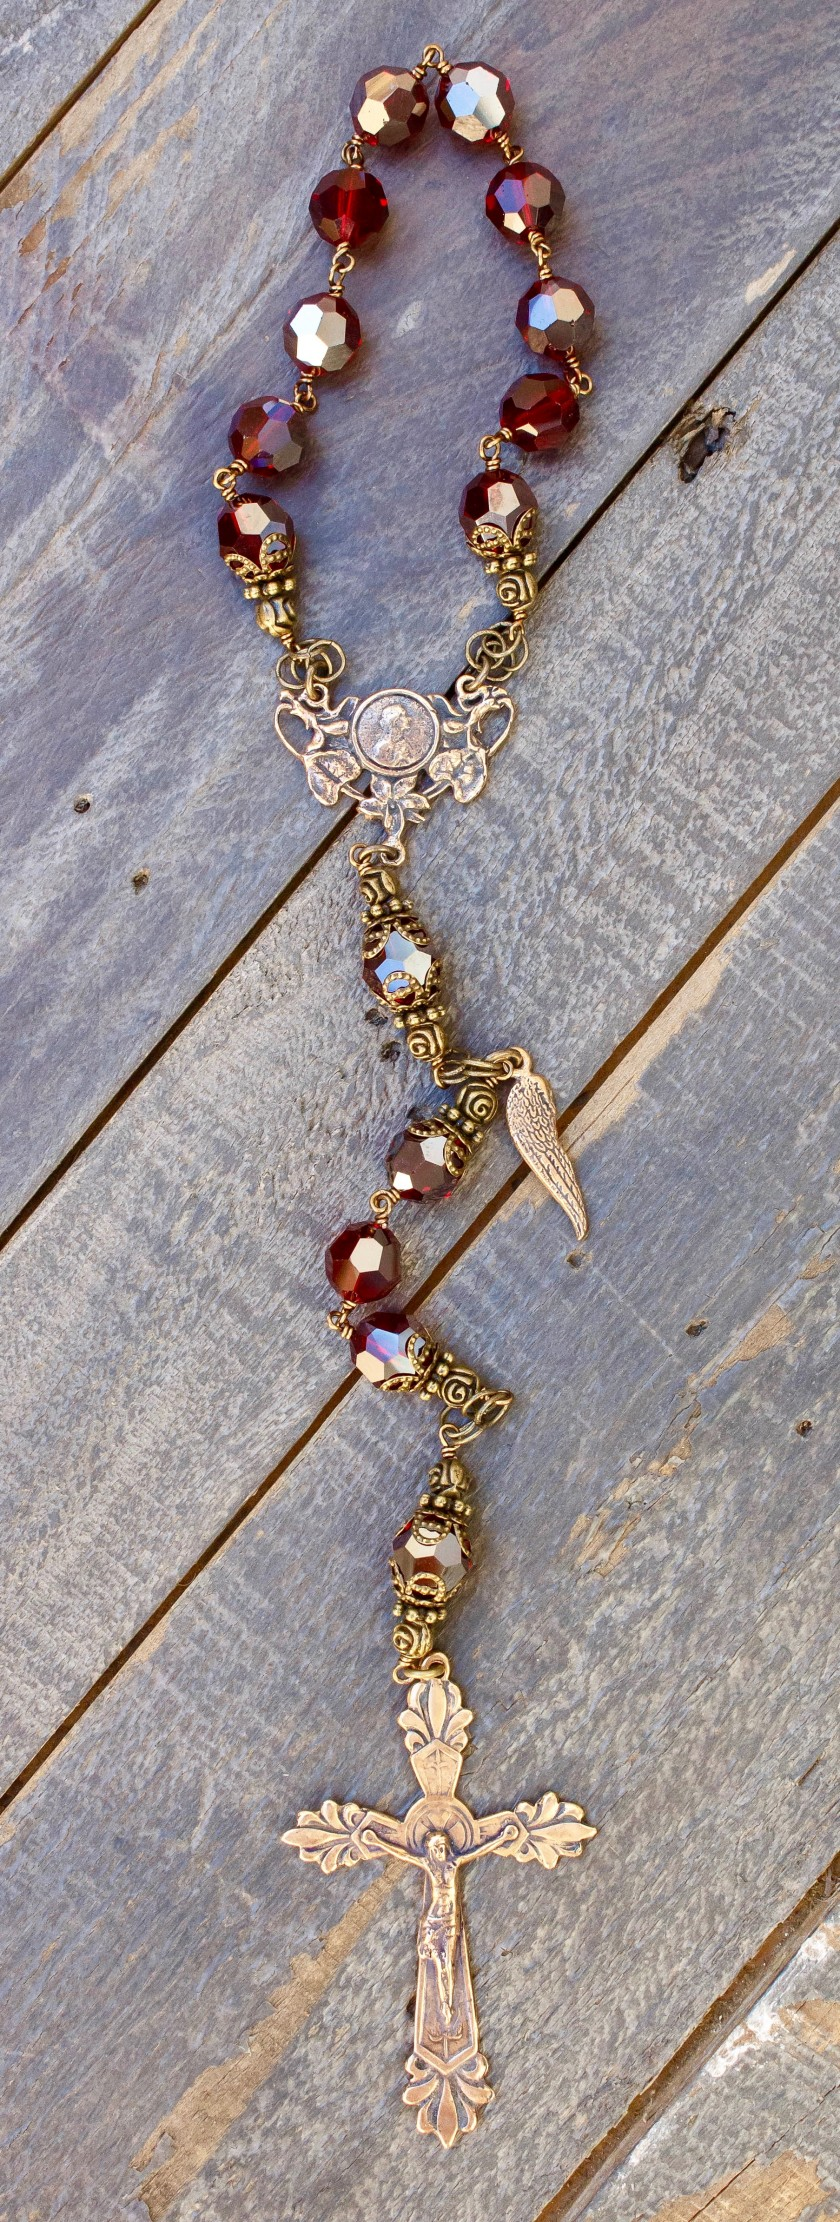 Garnet Swarovski One-Decade Heirloom Rosary 10mm